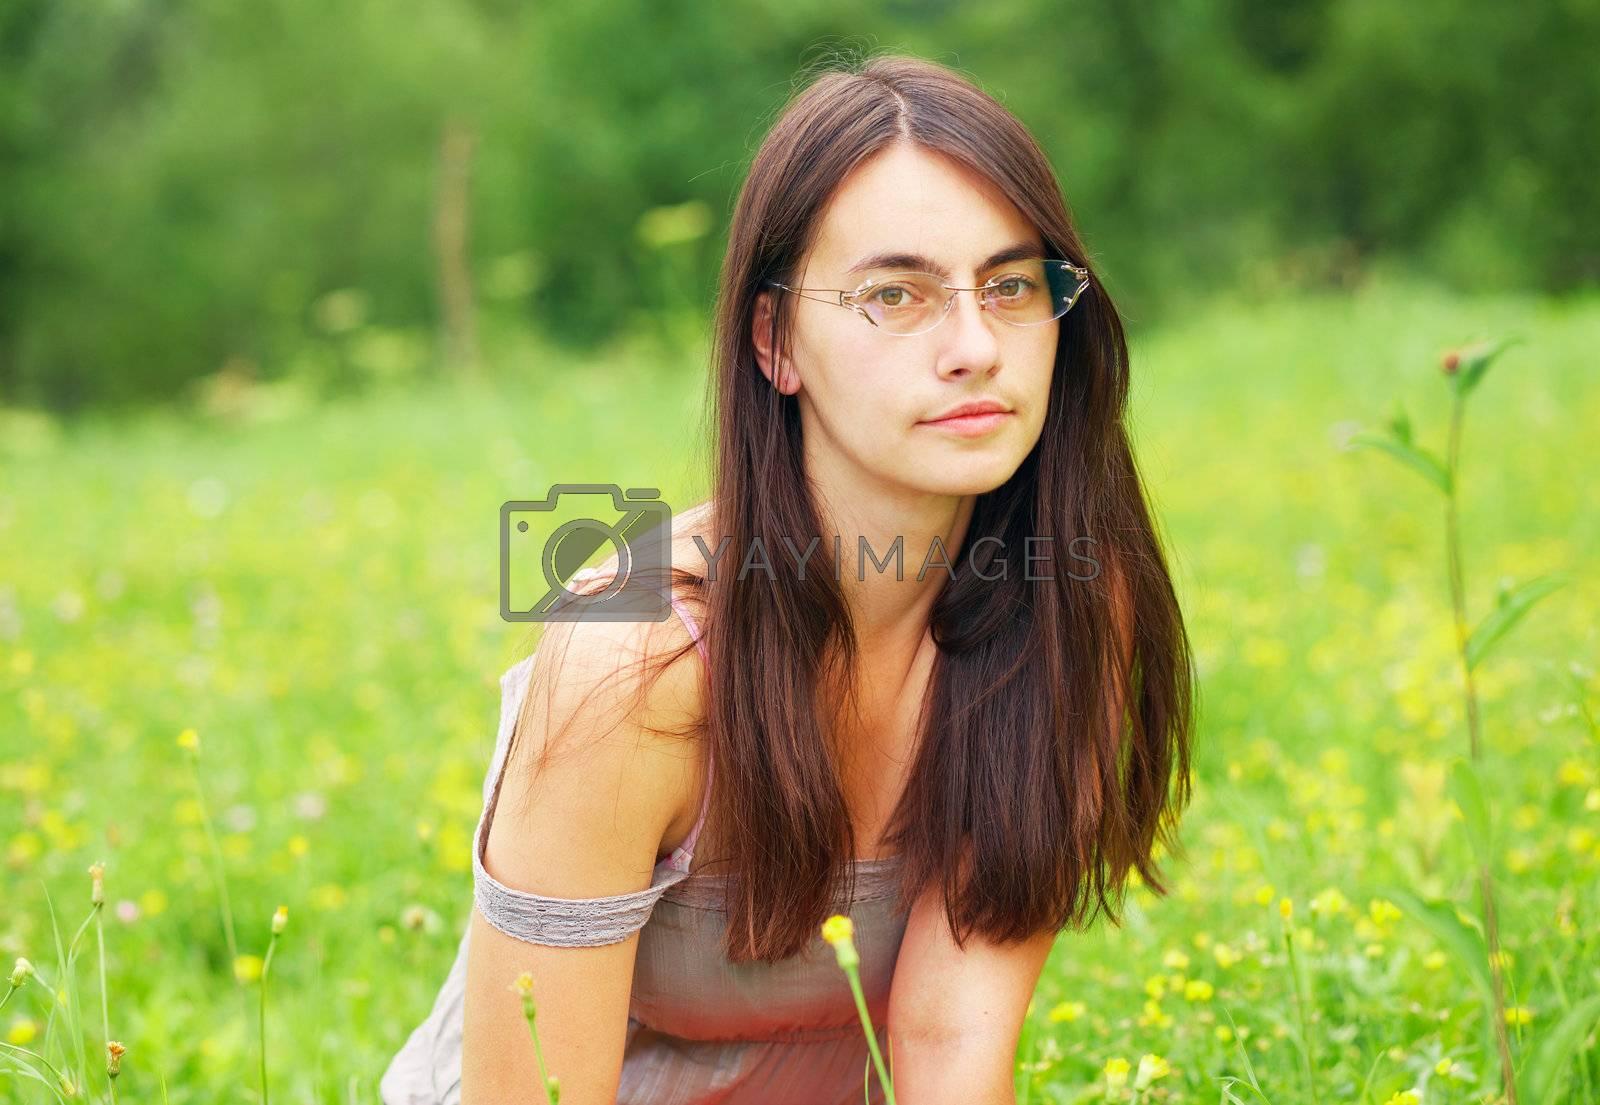 Portrait of a woman. She is sitting in a green meadow